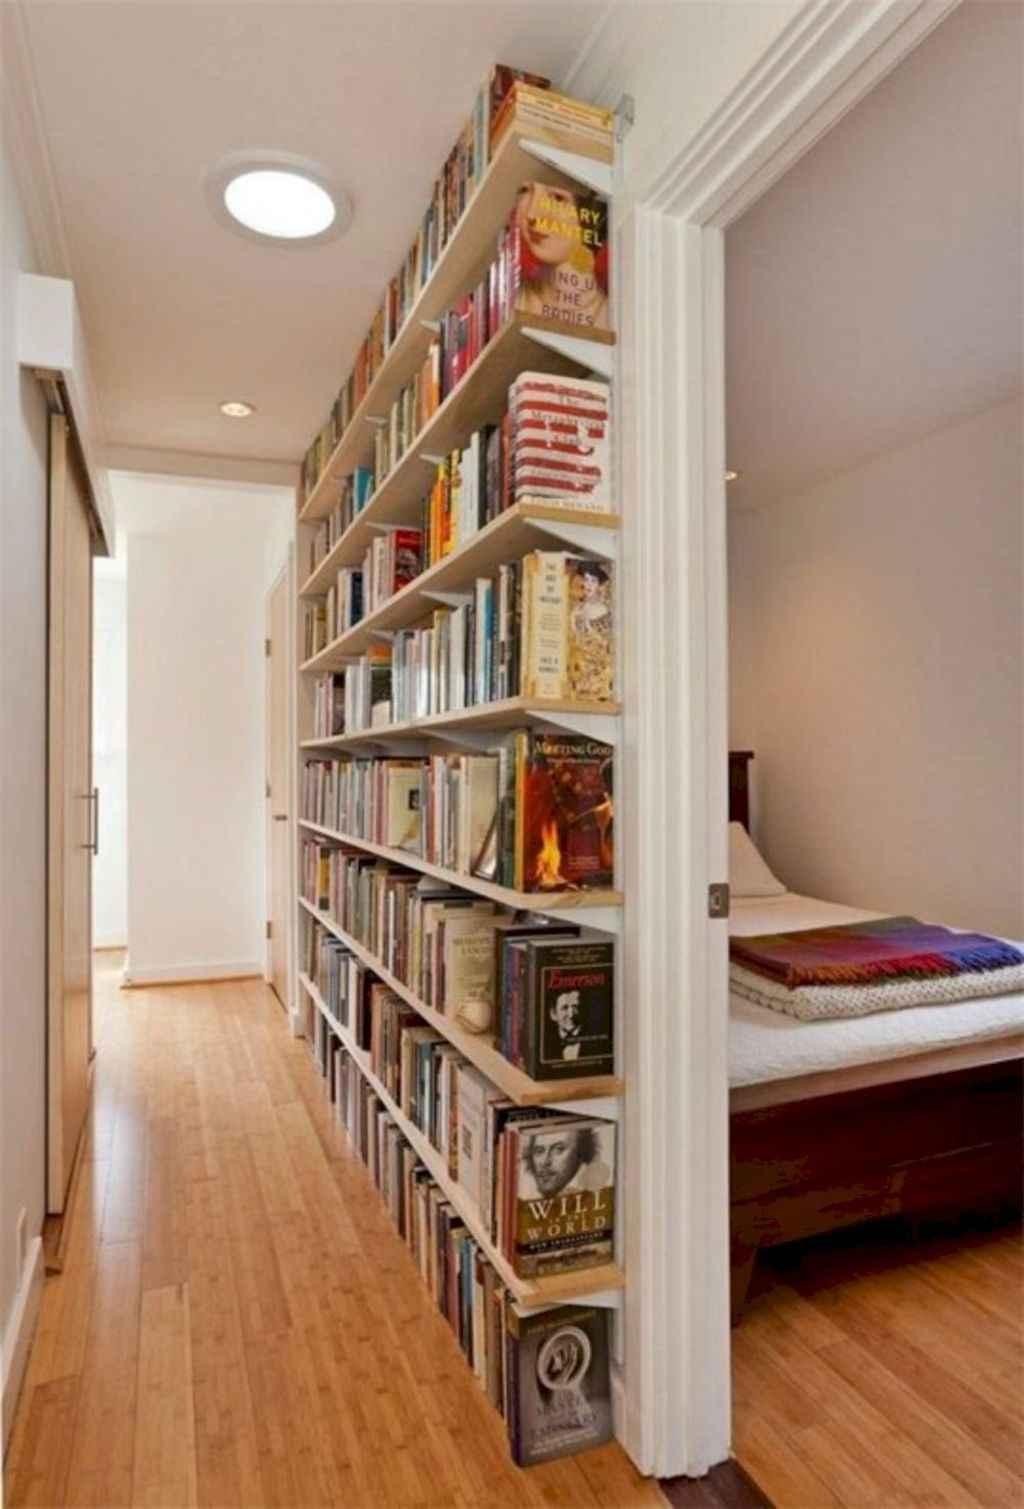 Small apartment decorating ideas (16)